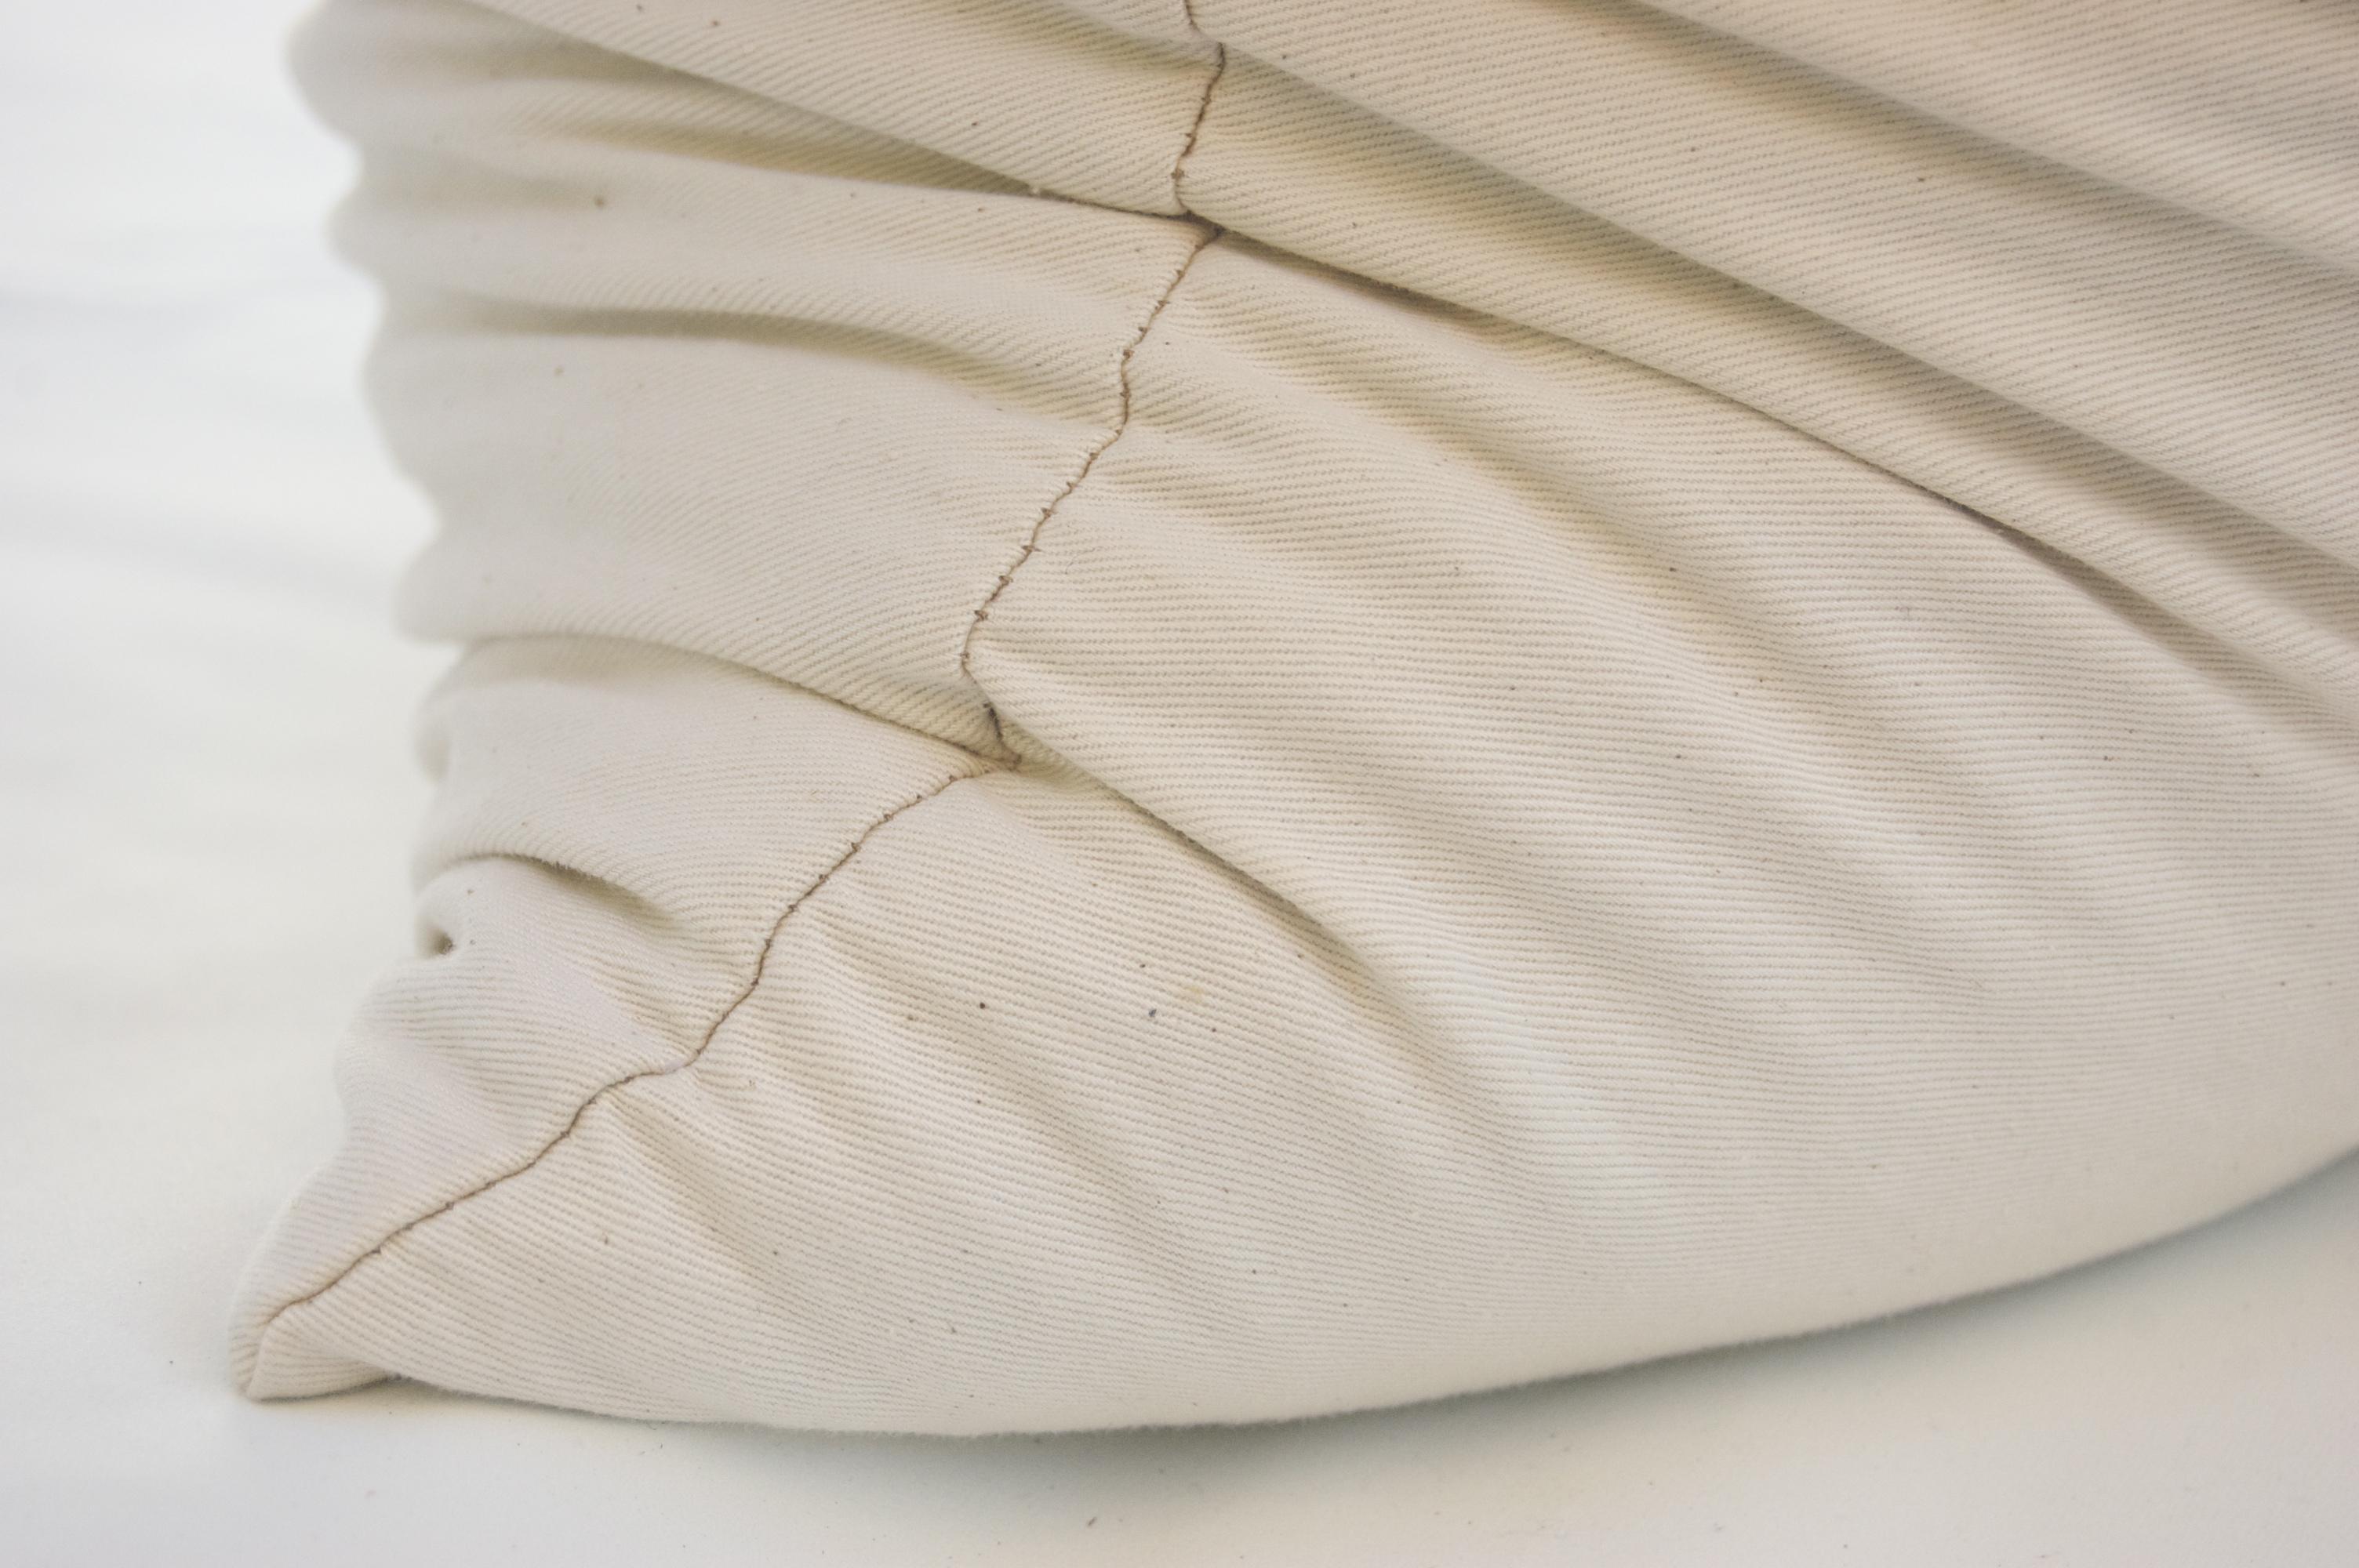 pinterest pinturas richard of printed luxury buckwheat beautiful fresh cushion woods pillow case pillows design